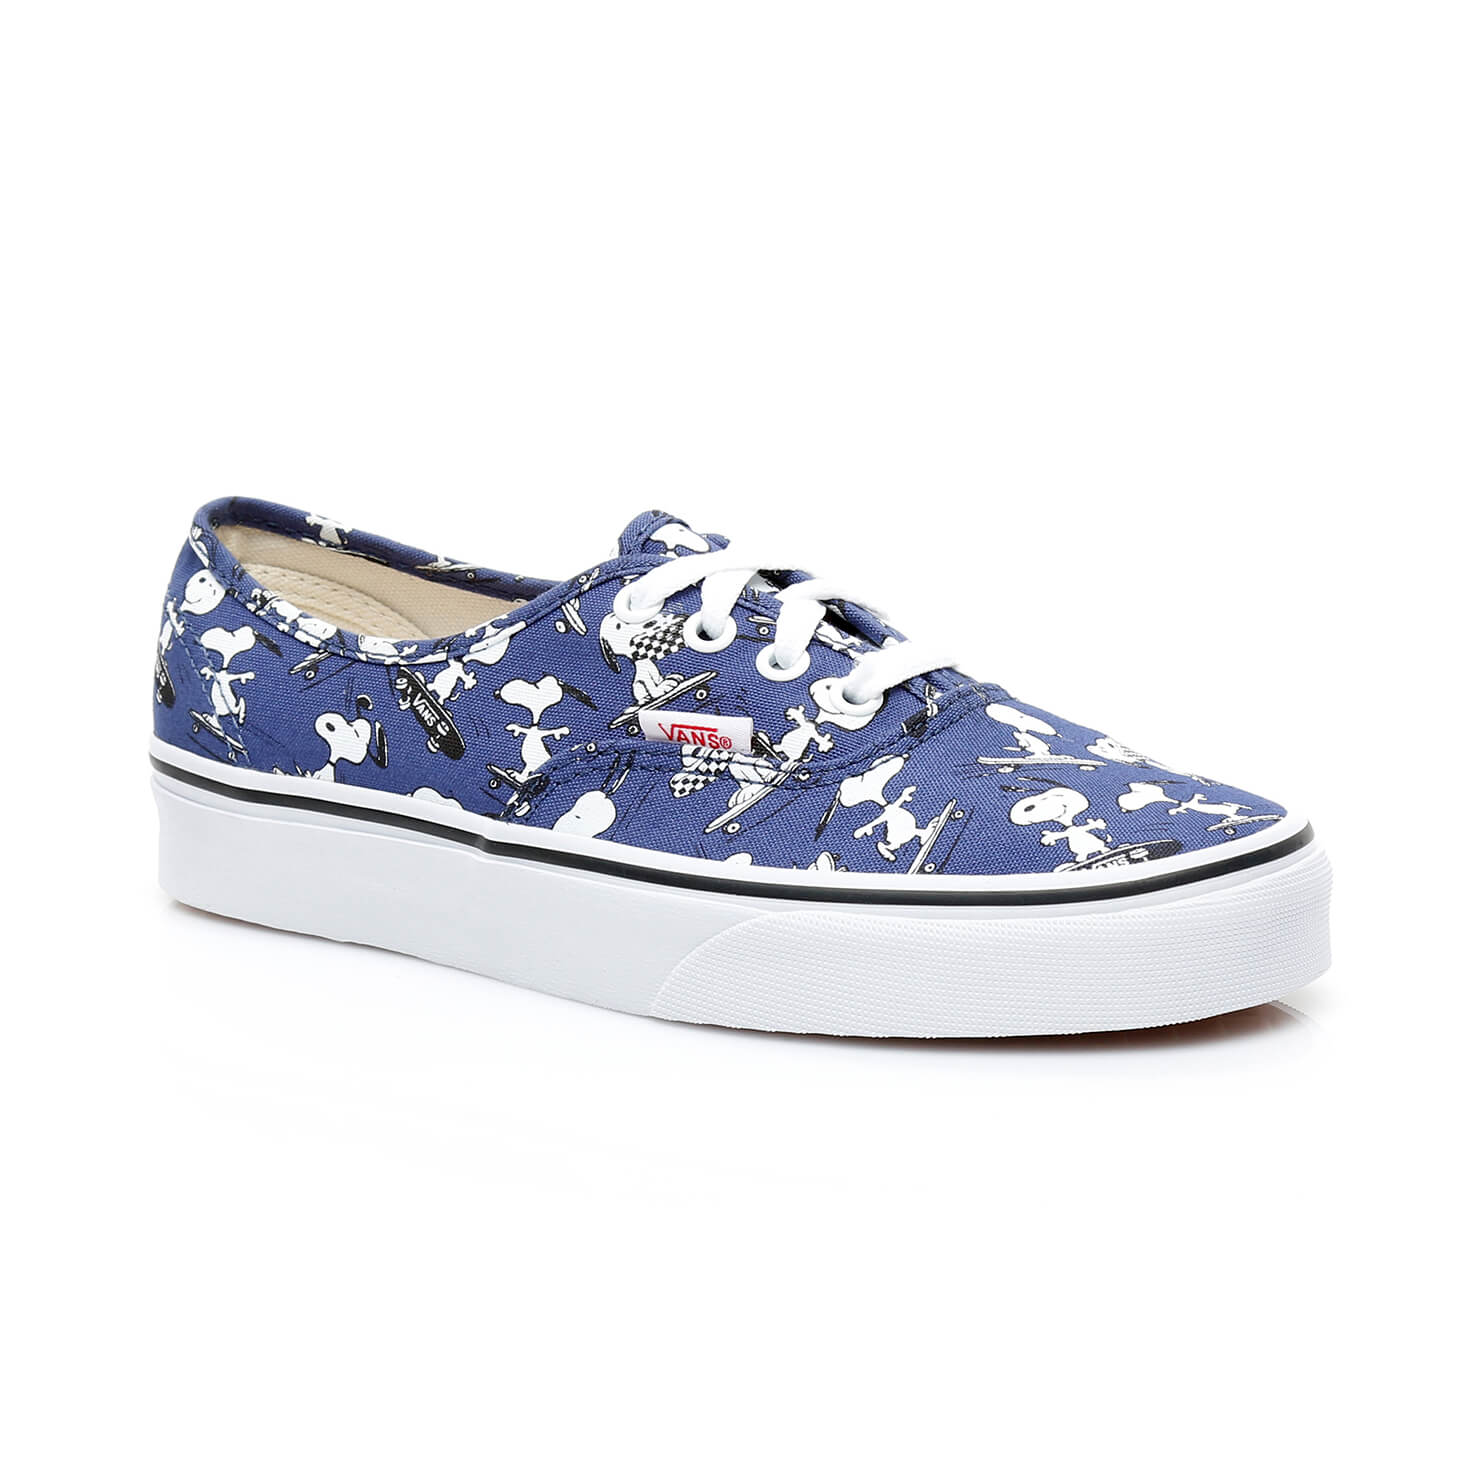 Vans Peanuts Ua Authentic Kadın Mavi Sneaker